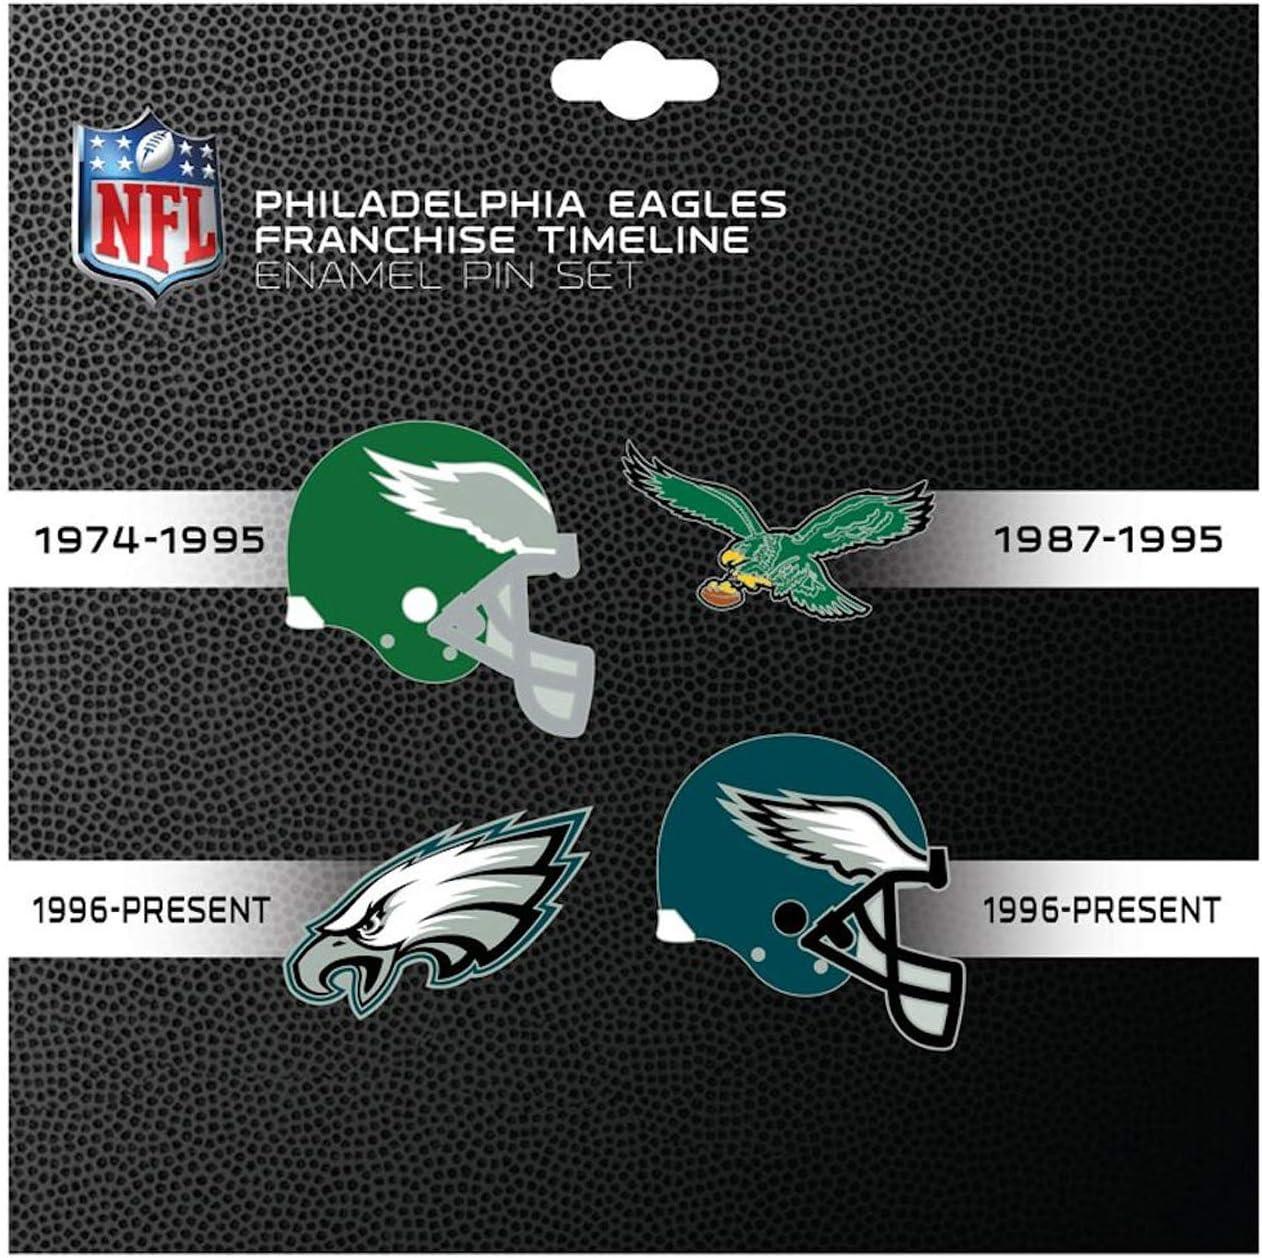 PSG Ranking TOP17 Philadelphia Eagles Lapel pin Set N Franchise Fort Worth Mall Timeline 4-pin